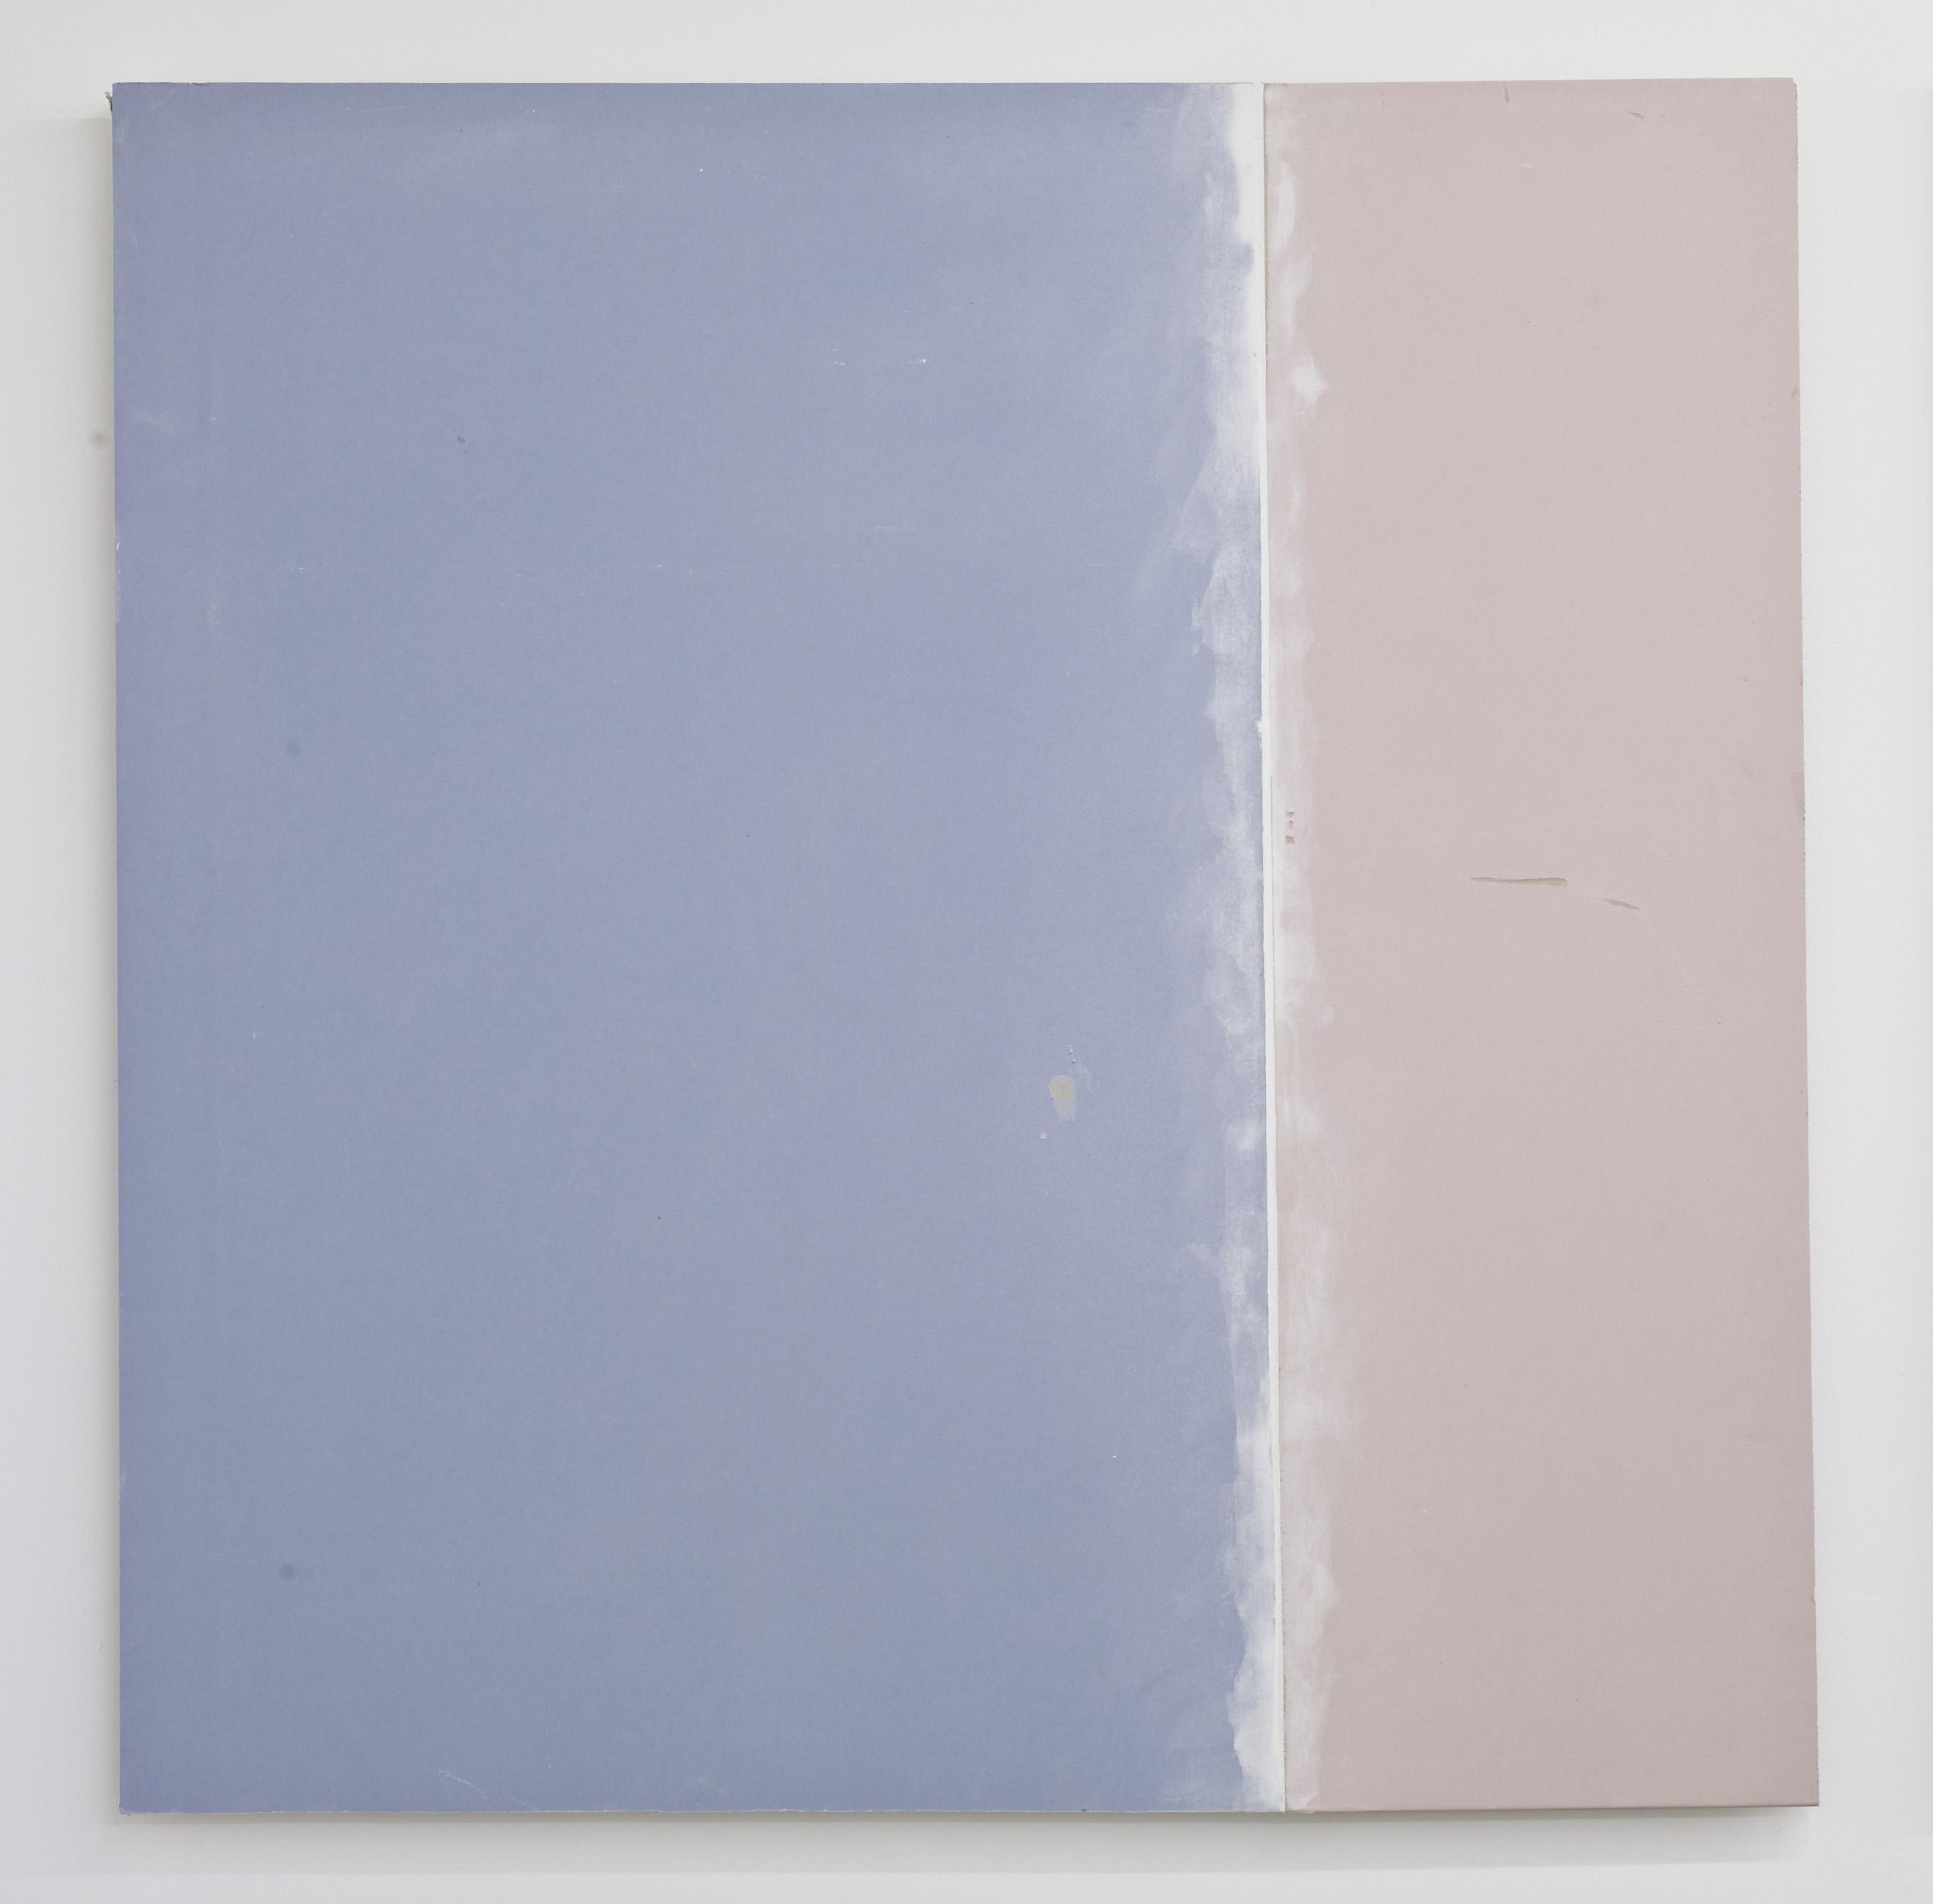 Untitled(2014)*blue:pink